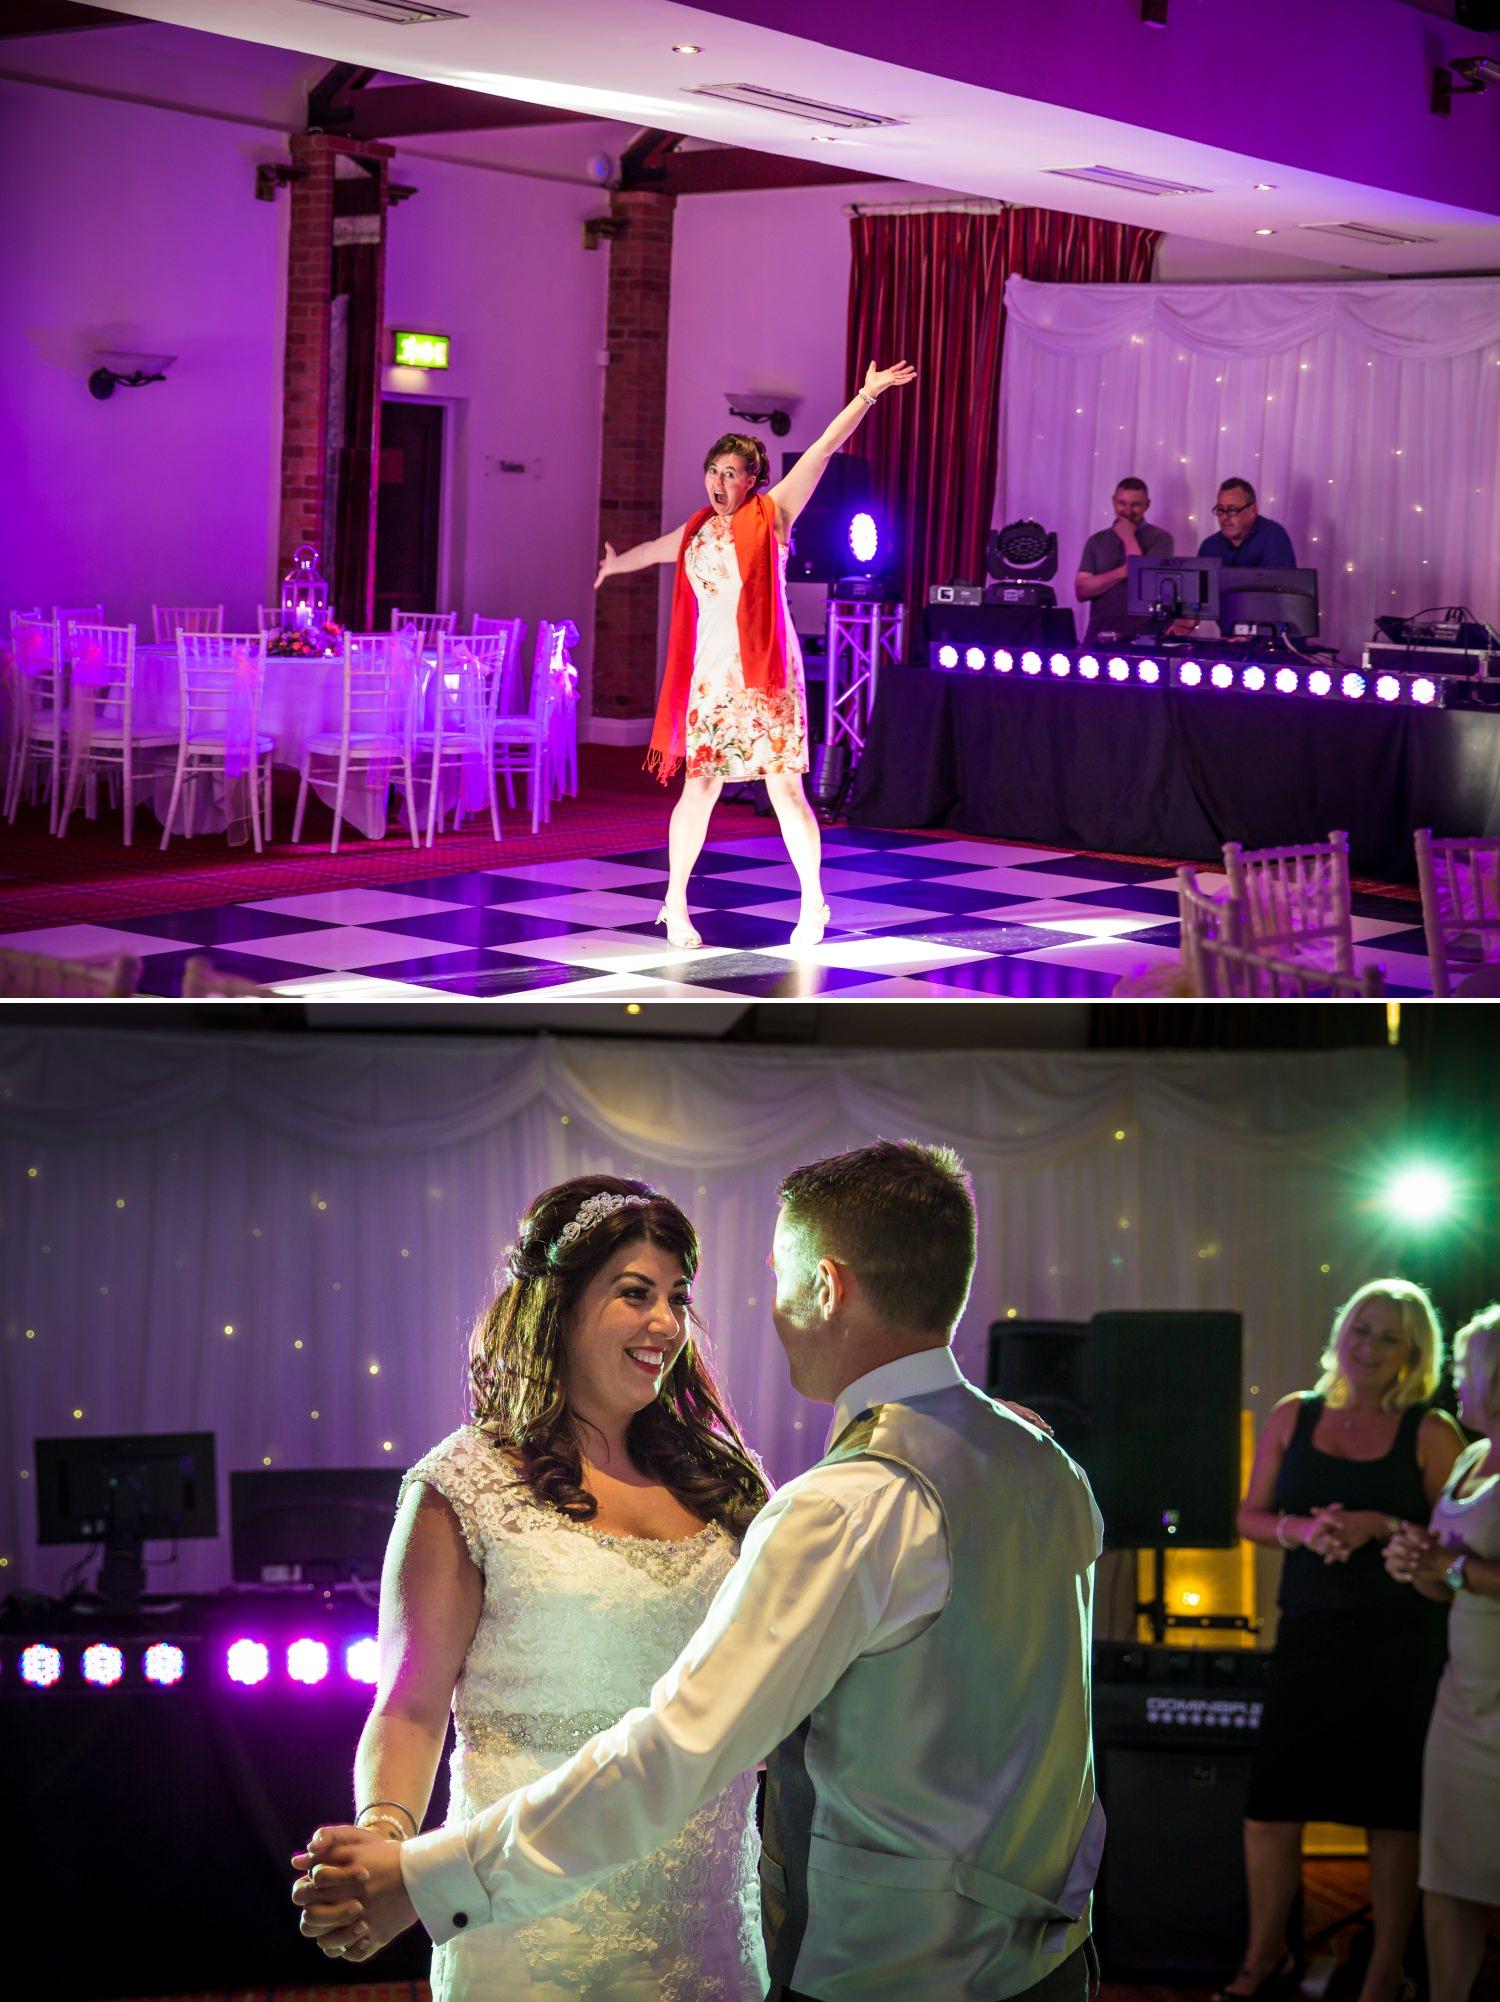 dancing Wedding Photograph at Carden Park